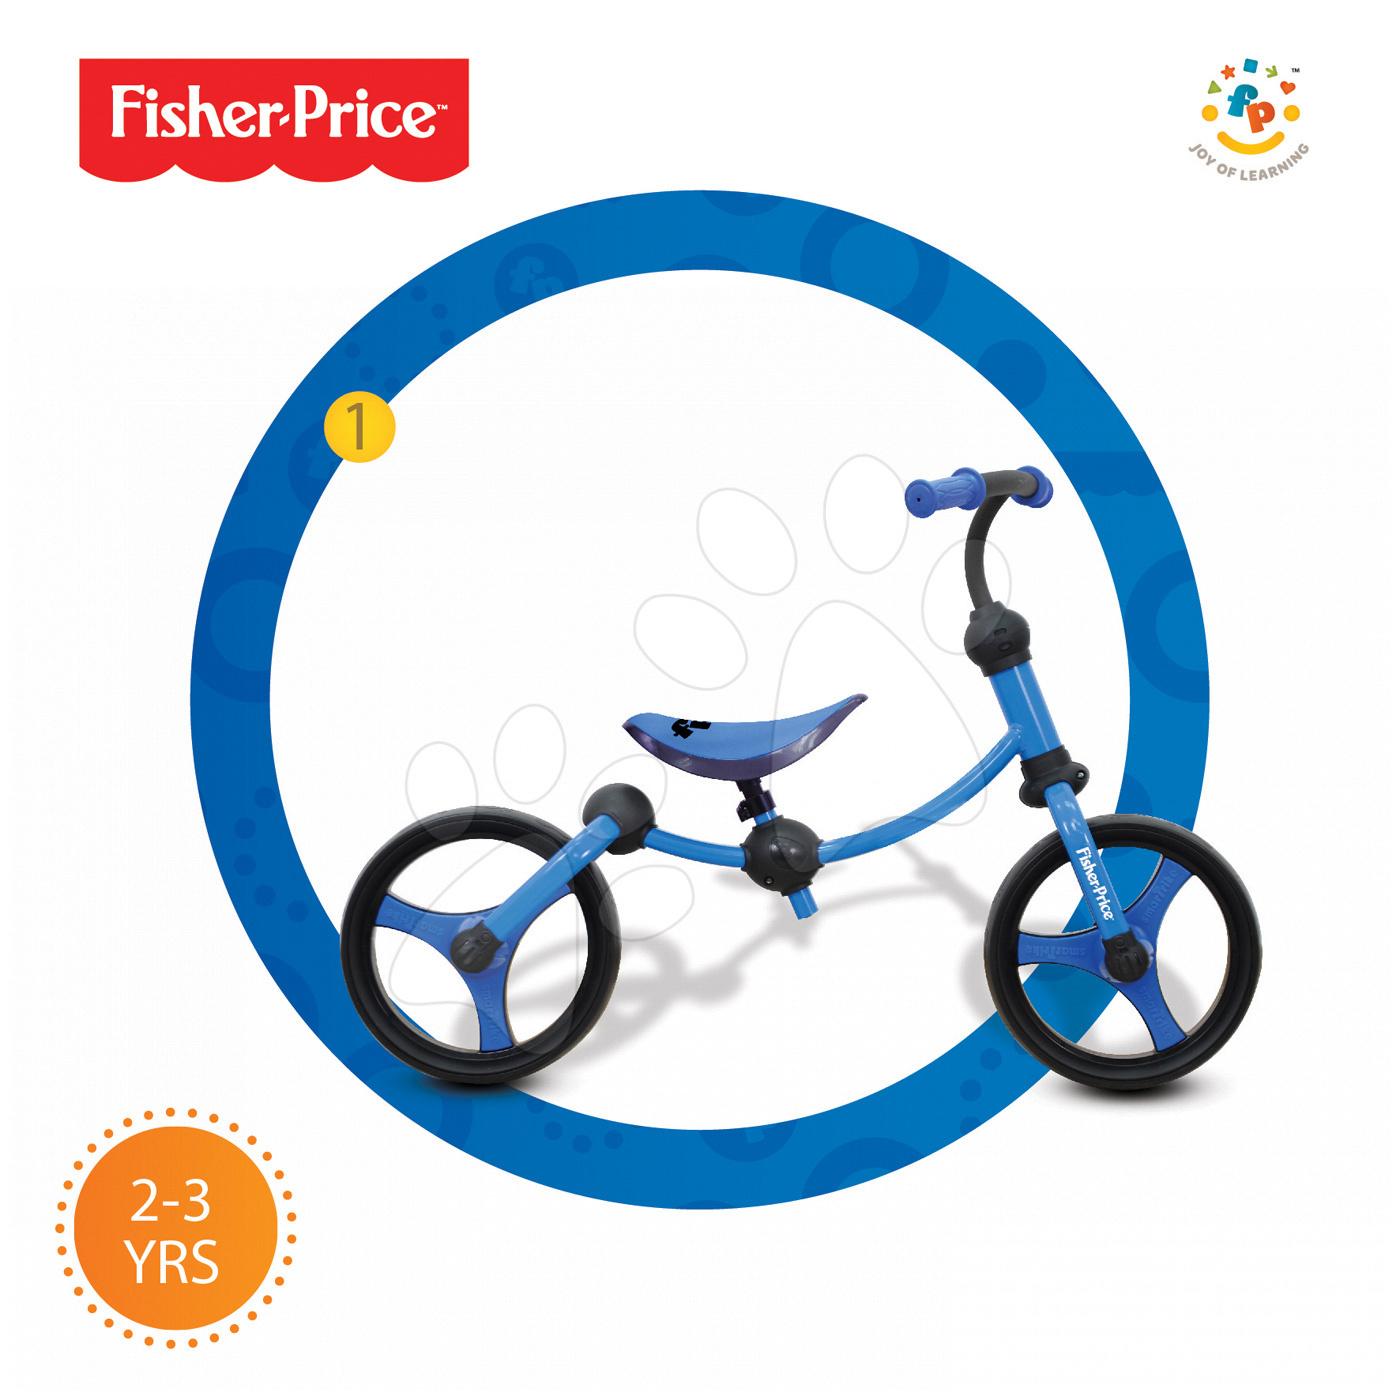 smarTrike detské odrážadlo Fisher-Price Running Bike 2v1 1050033 modro-čierne